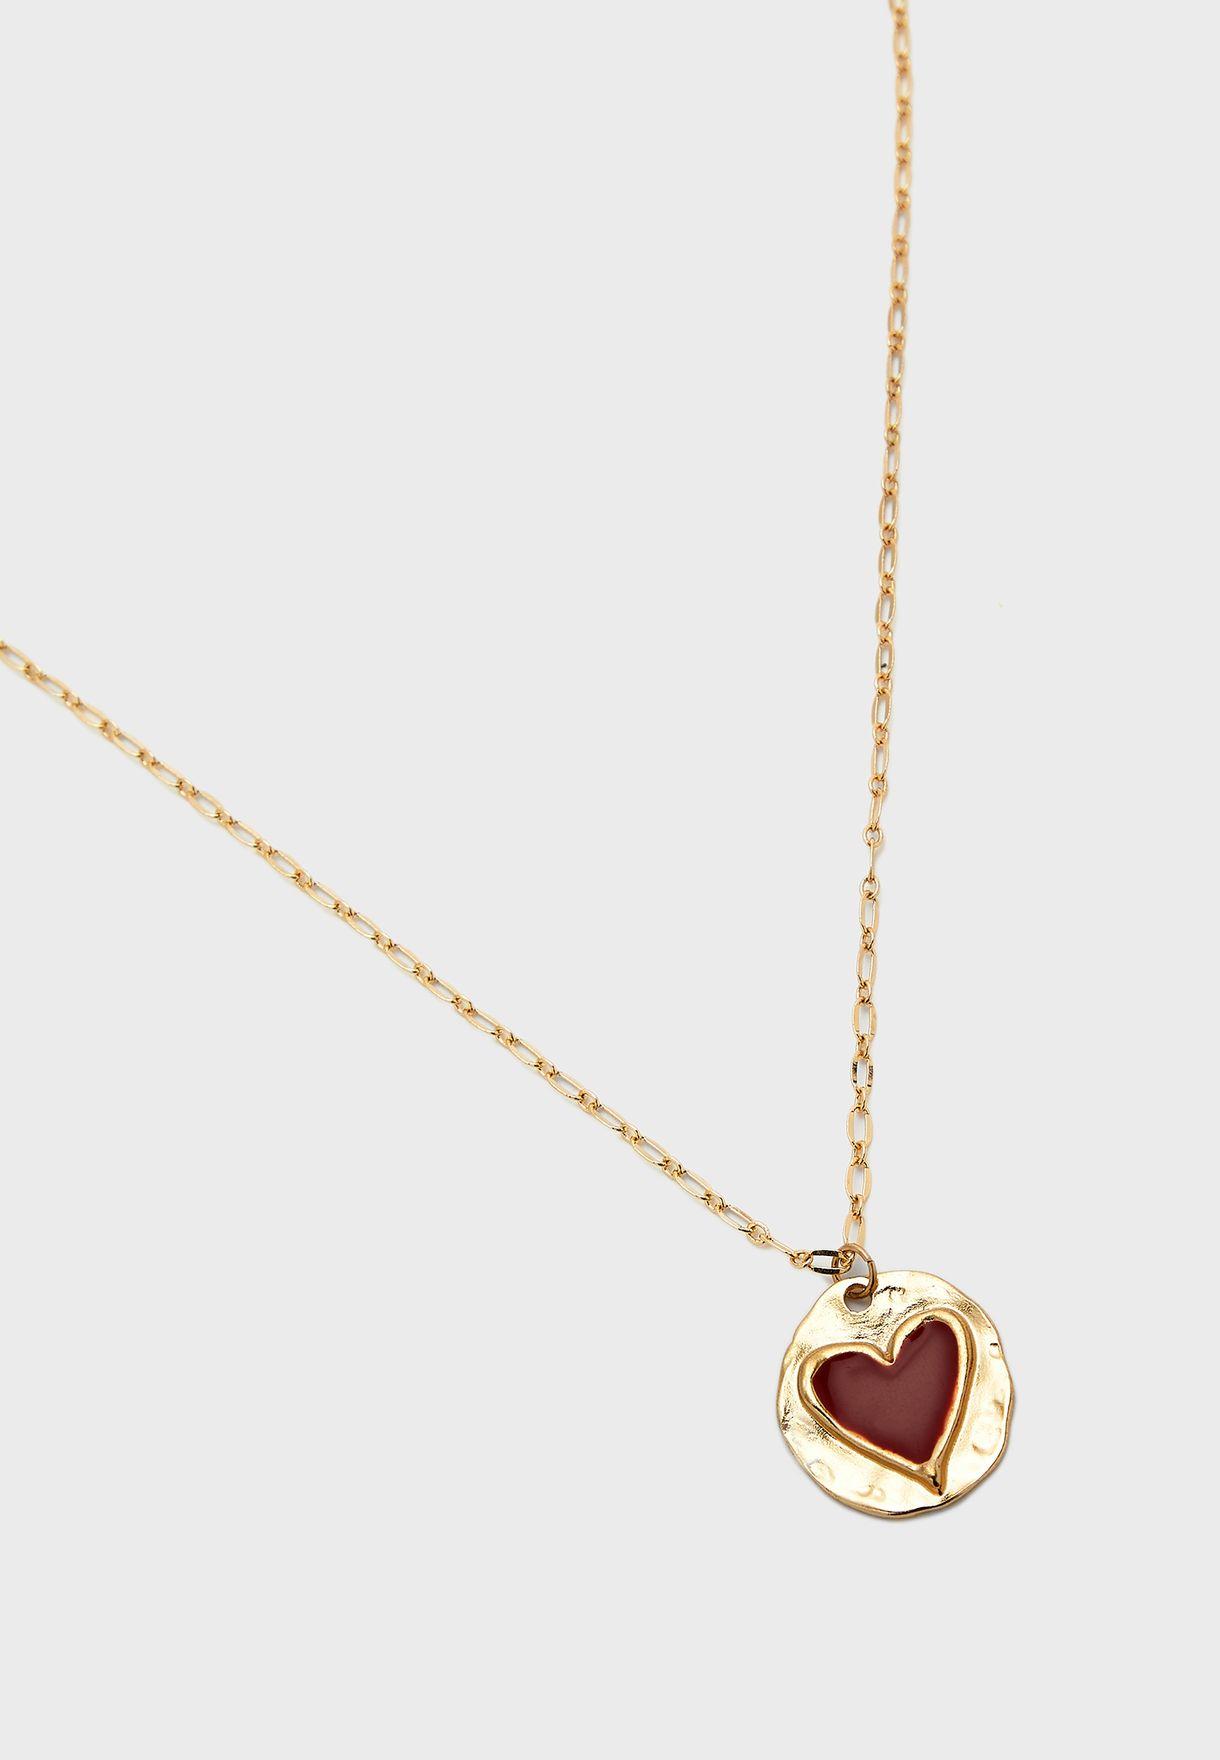 Heart Pendant Neklace